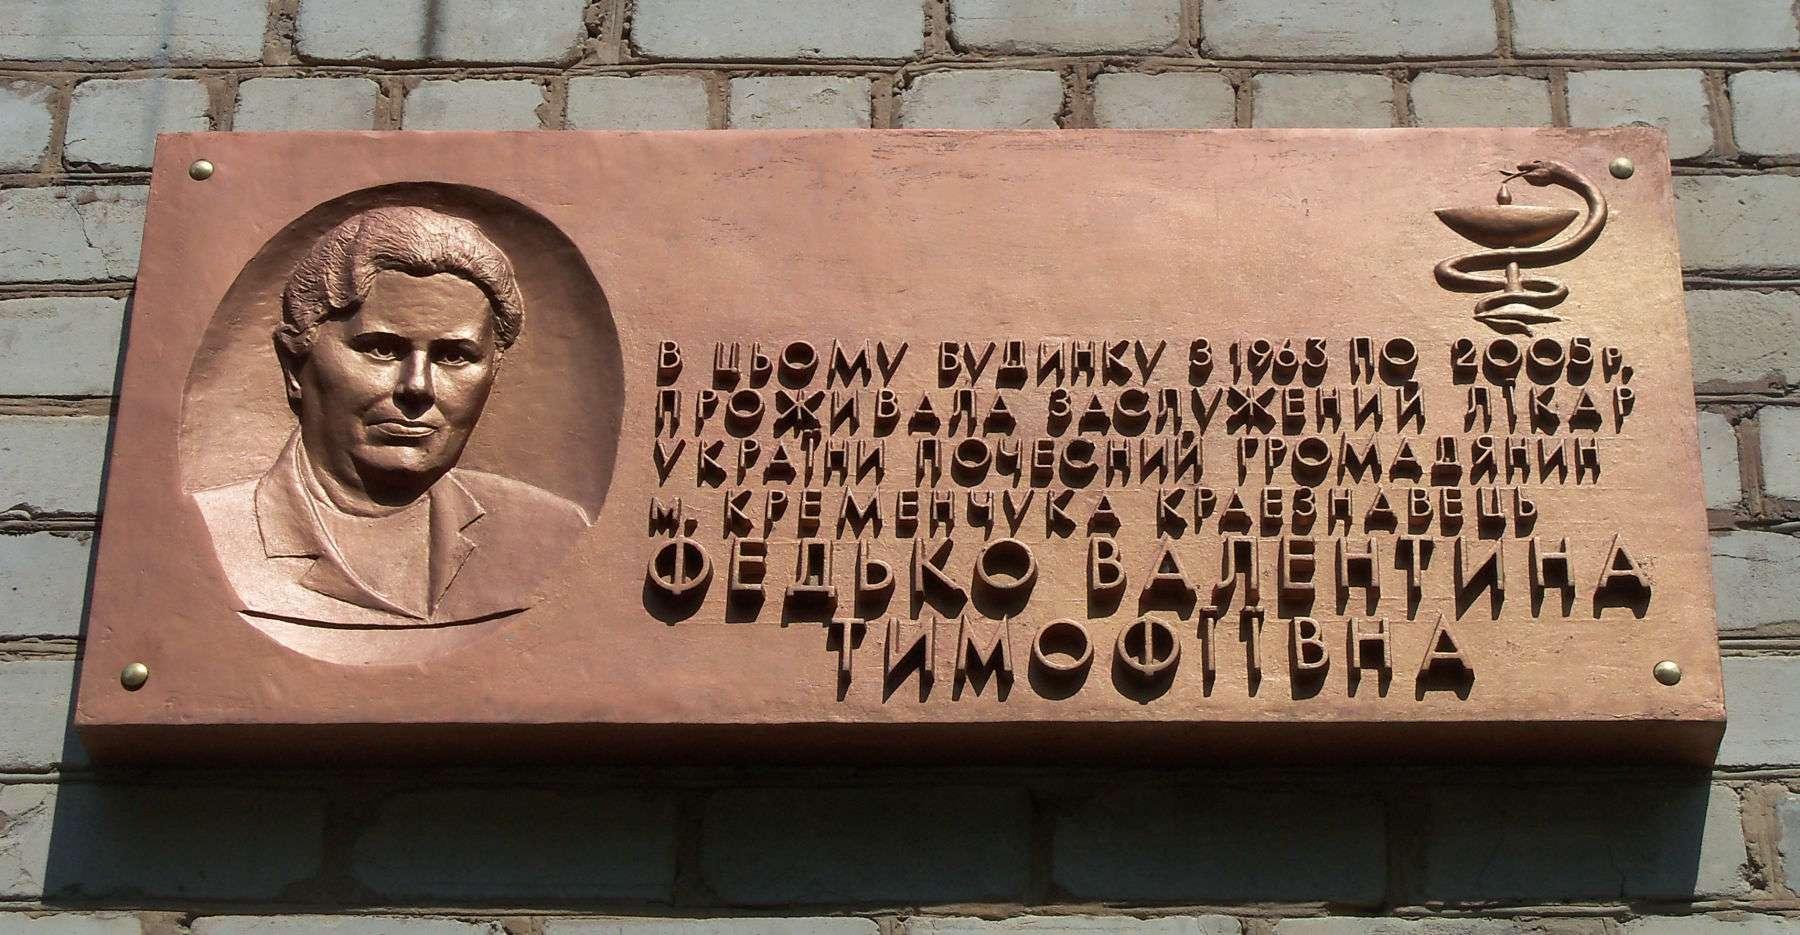 Федя Валентина Тимофеевна